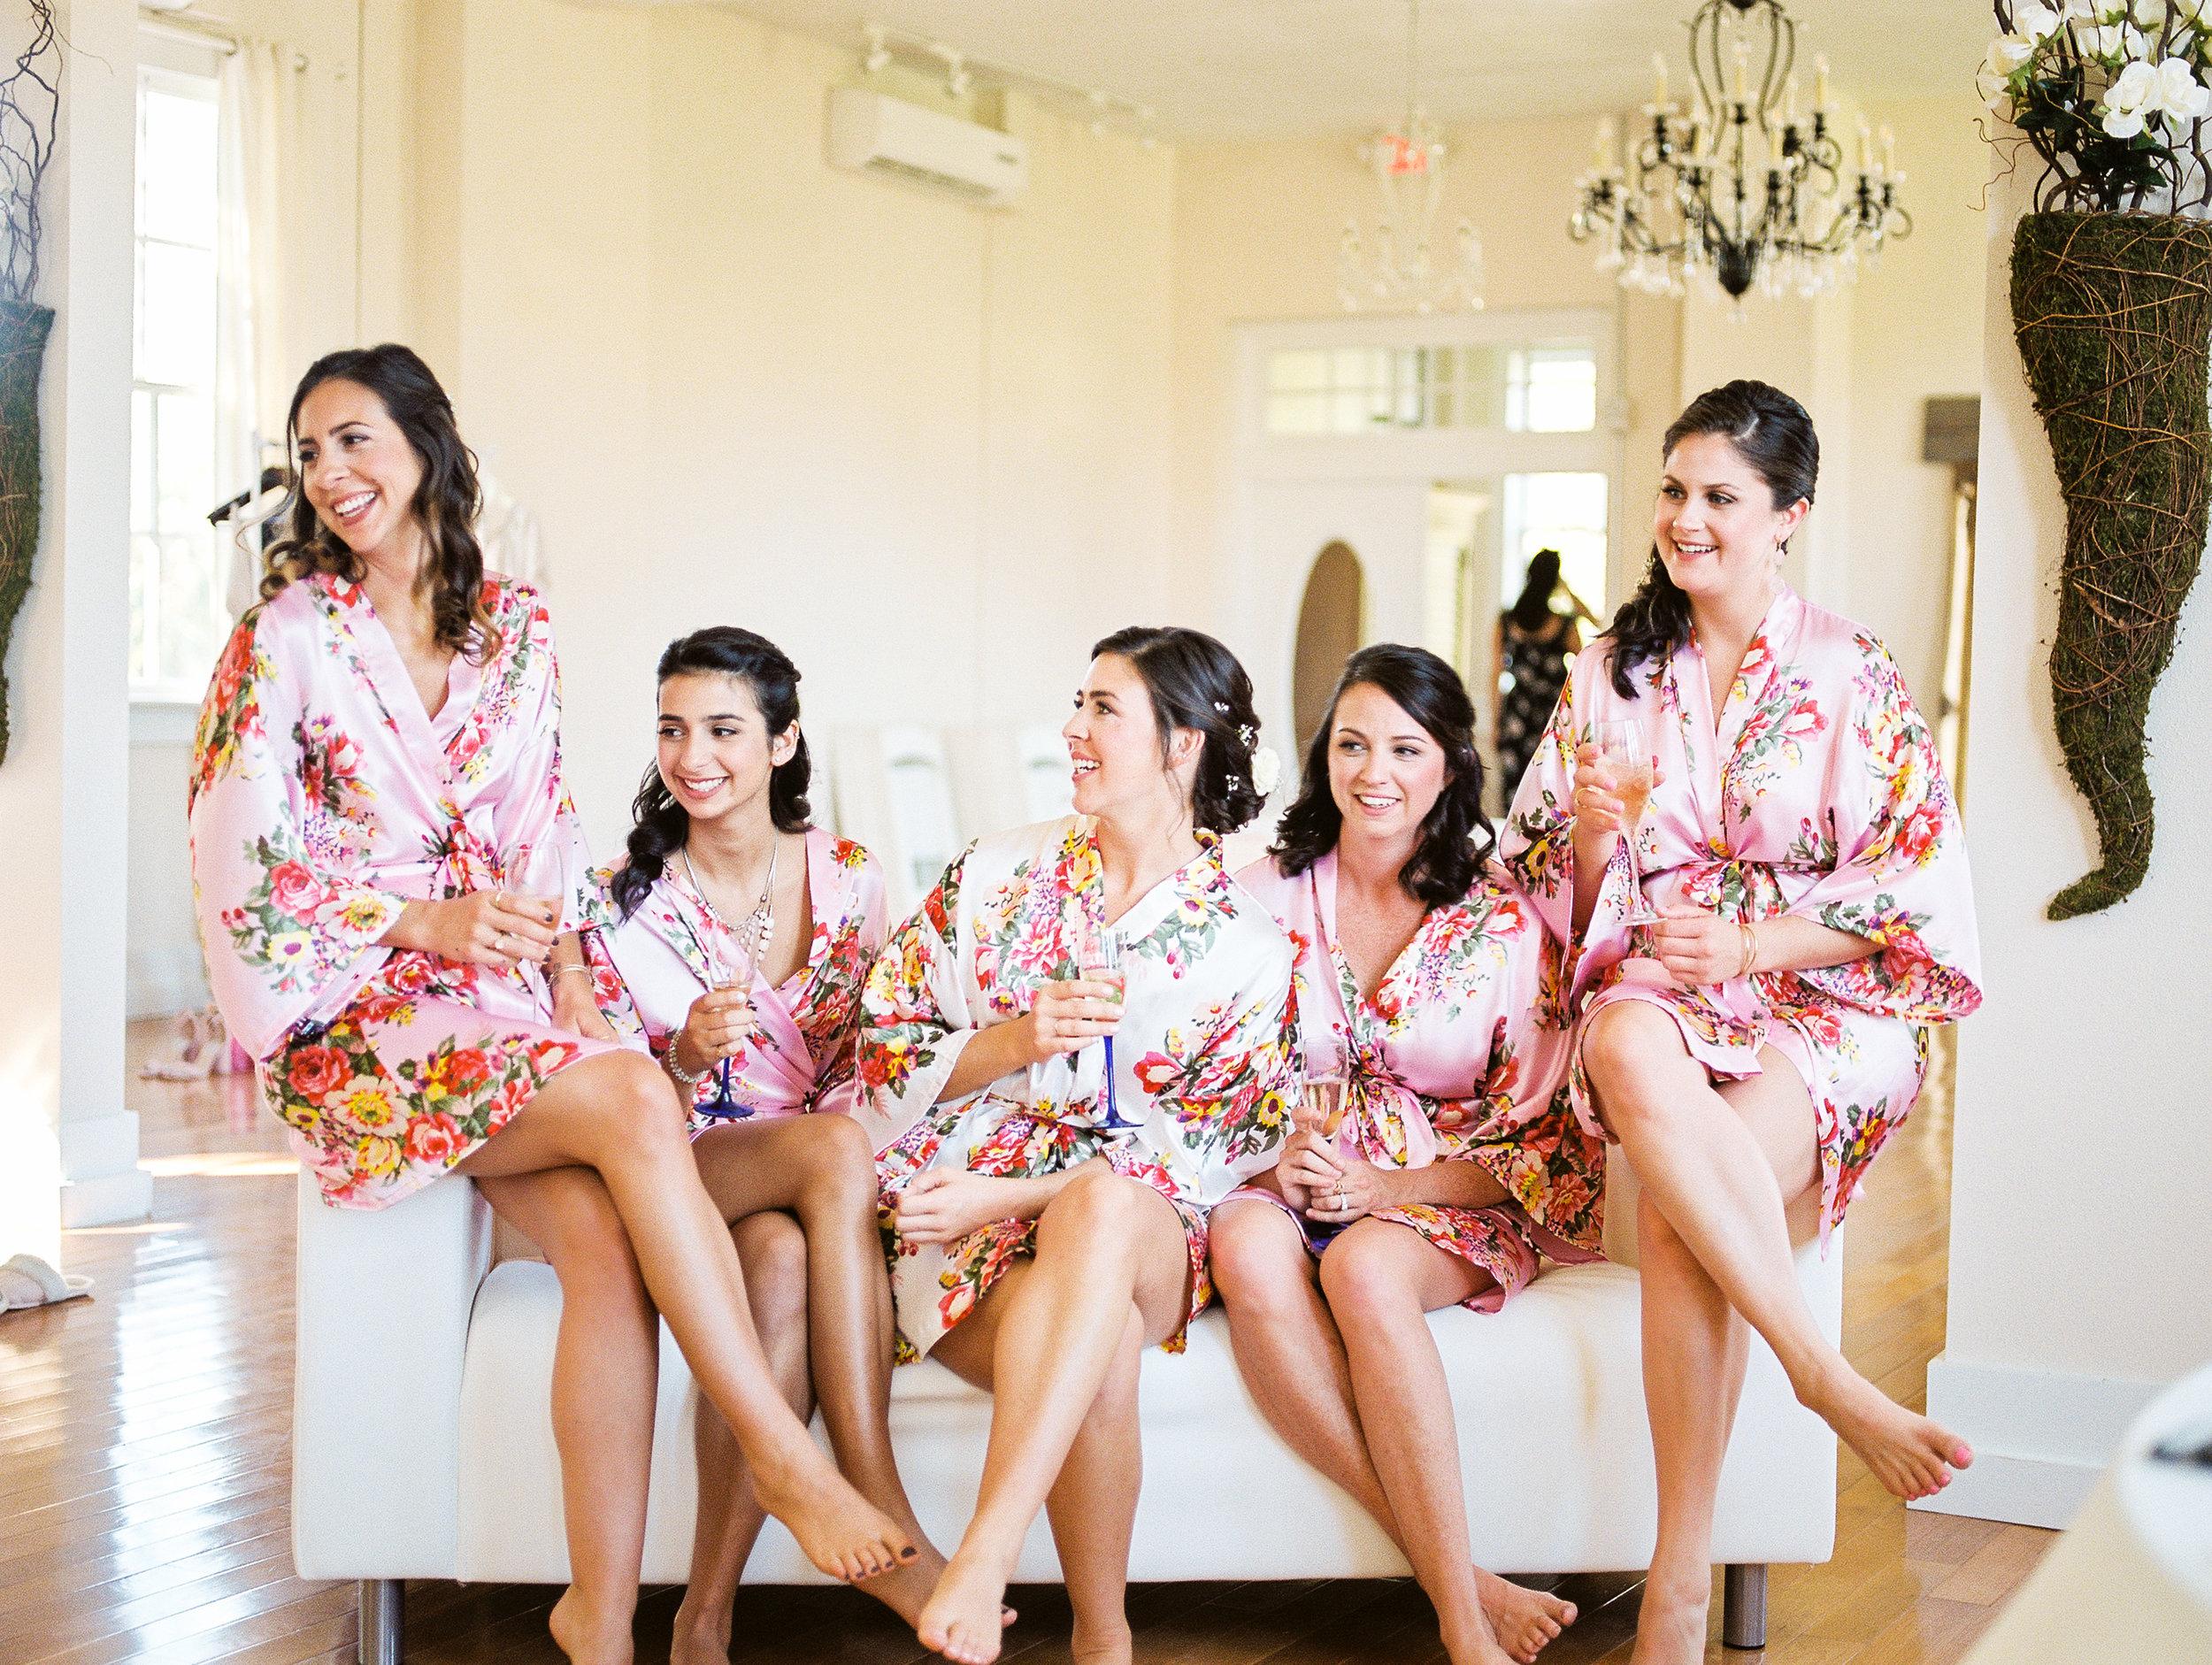 banyan-estate-wedding-photography-jessica-bellinger-orlando-fl-057.jpg